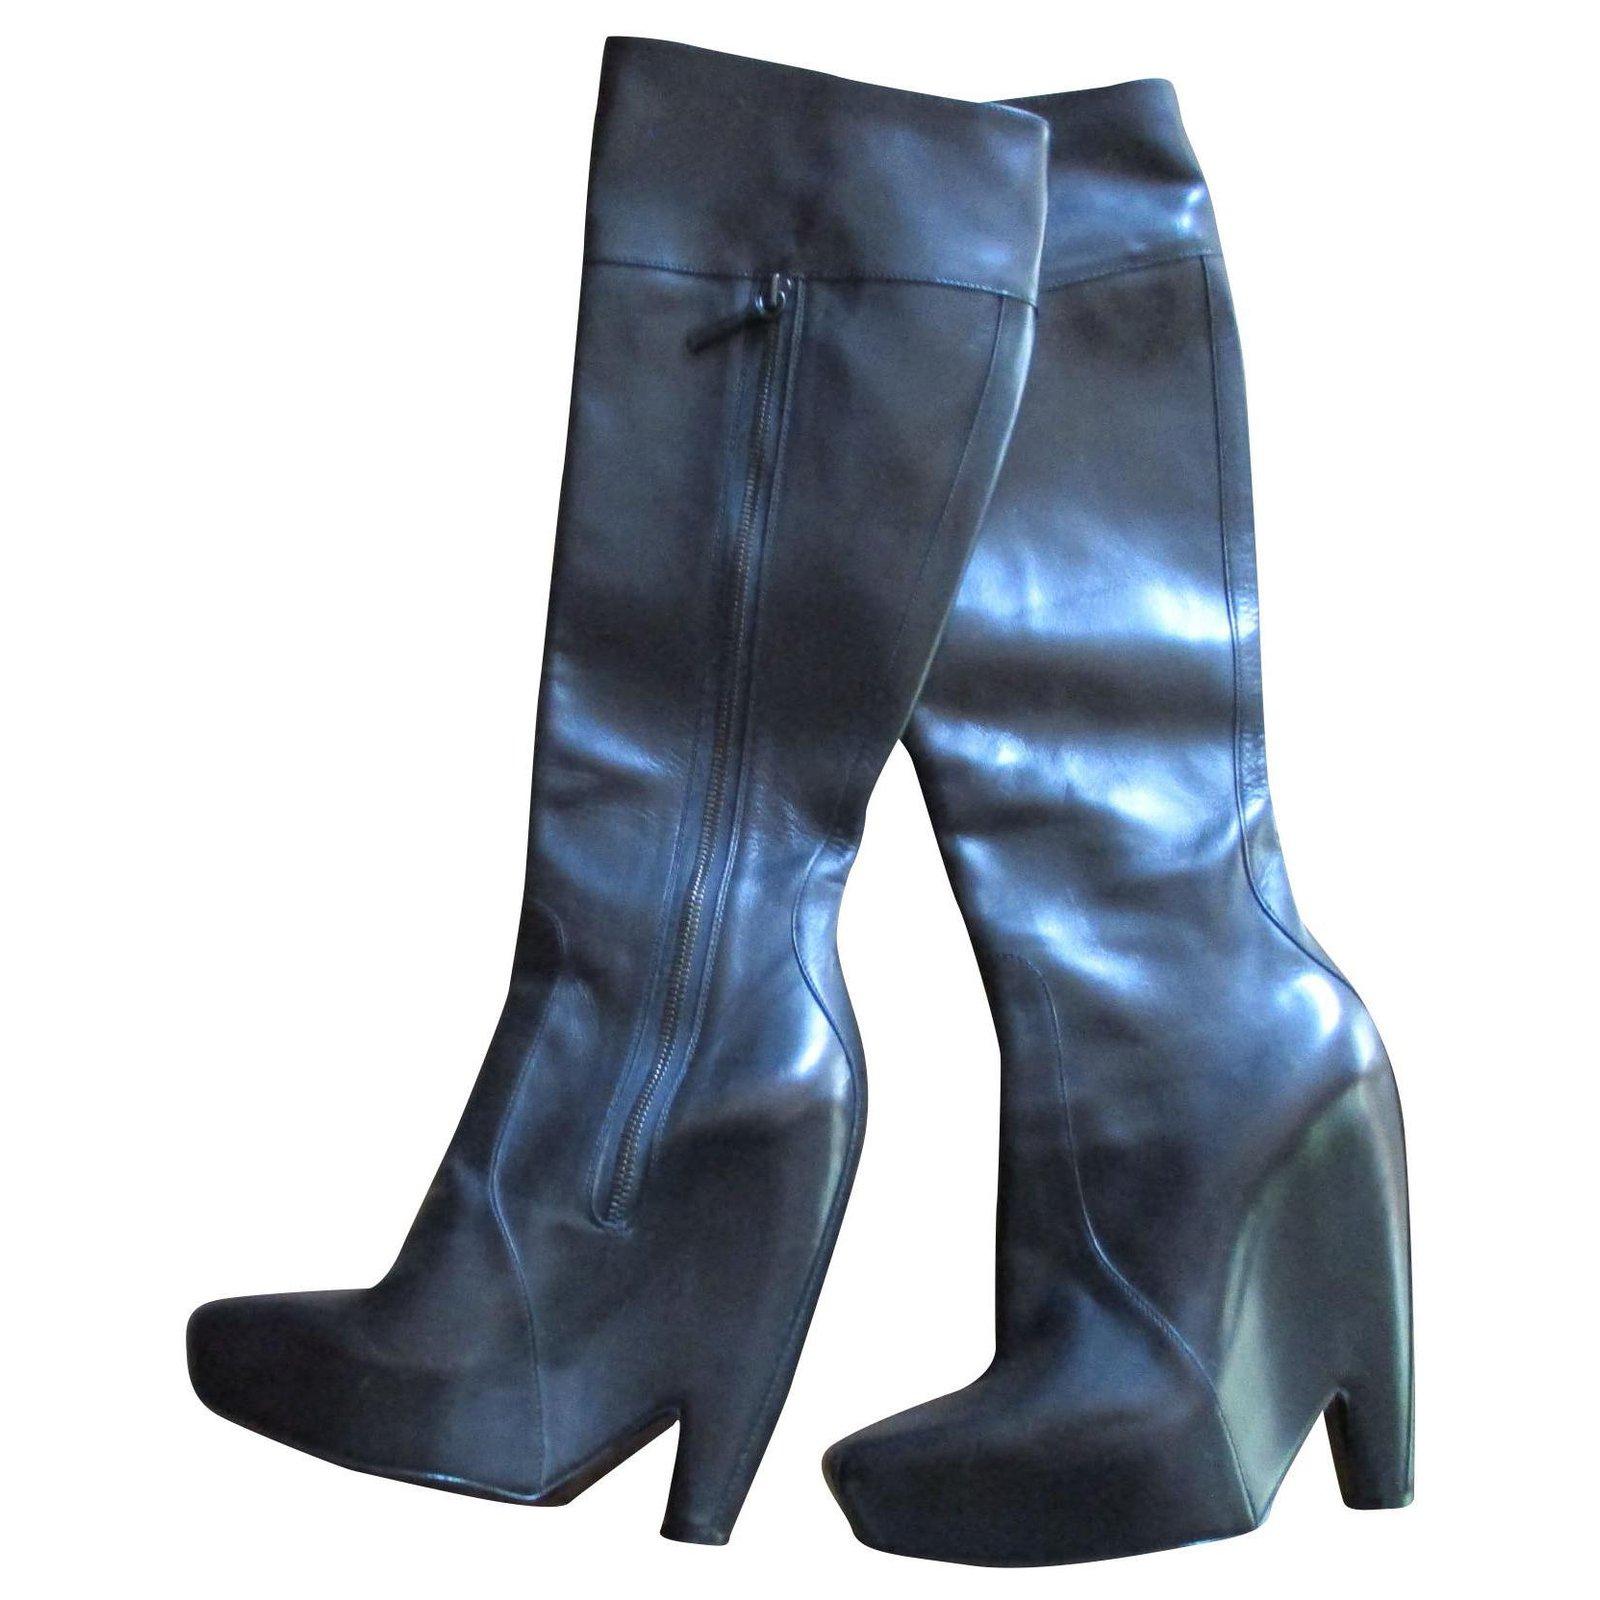 Balenciaga Black leather boots, 36,5 IT